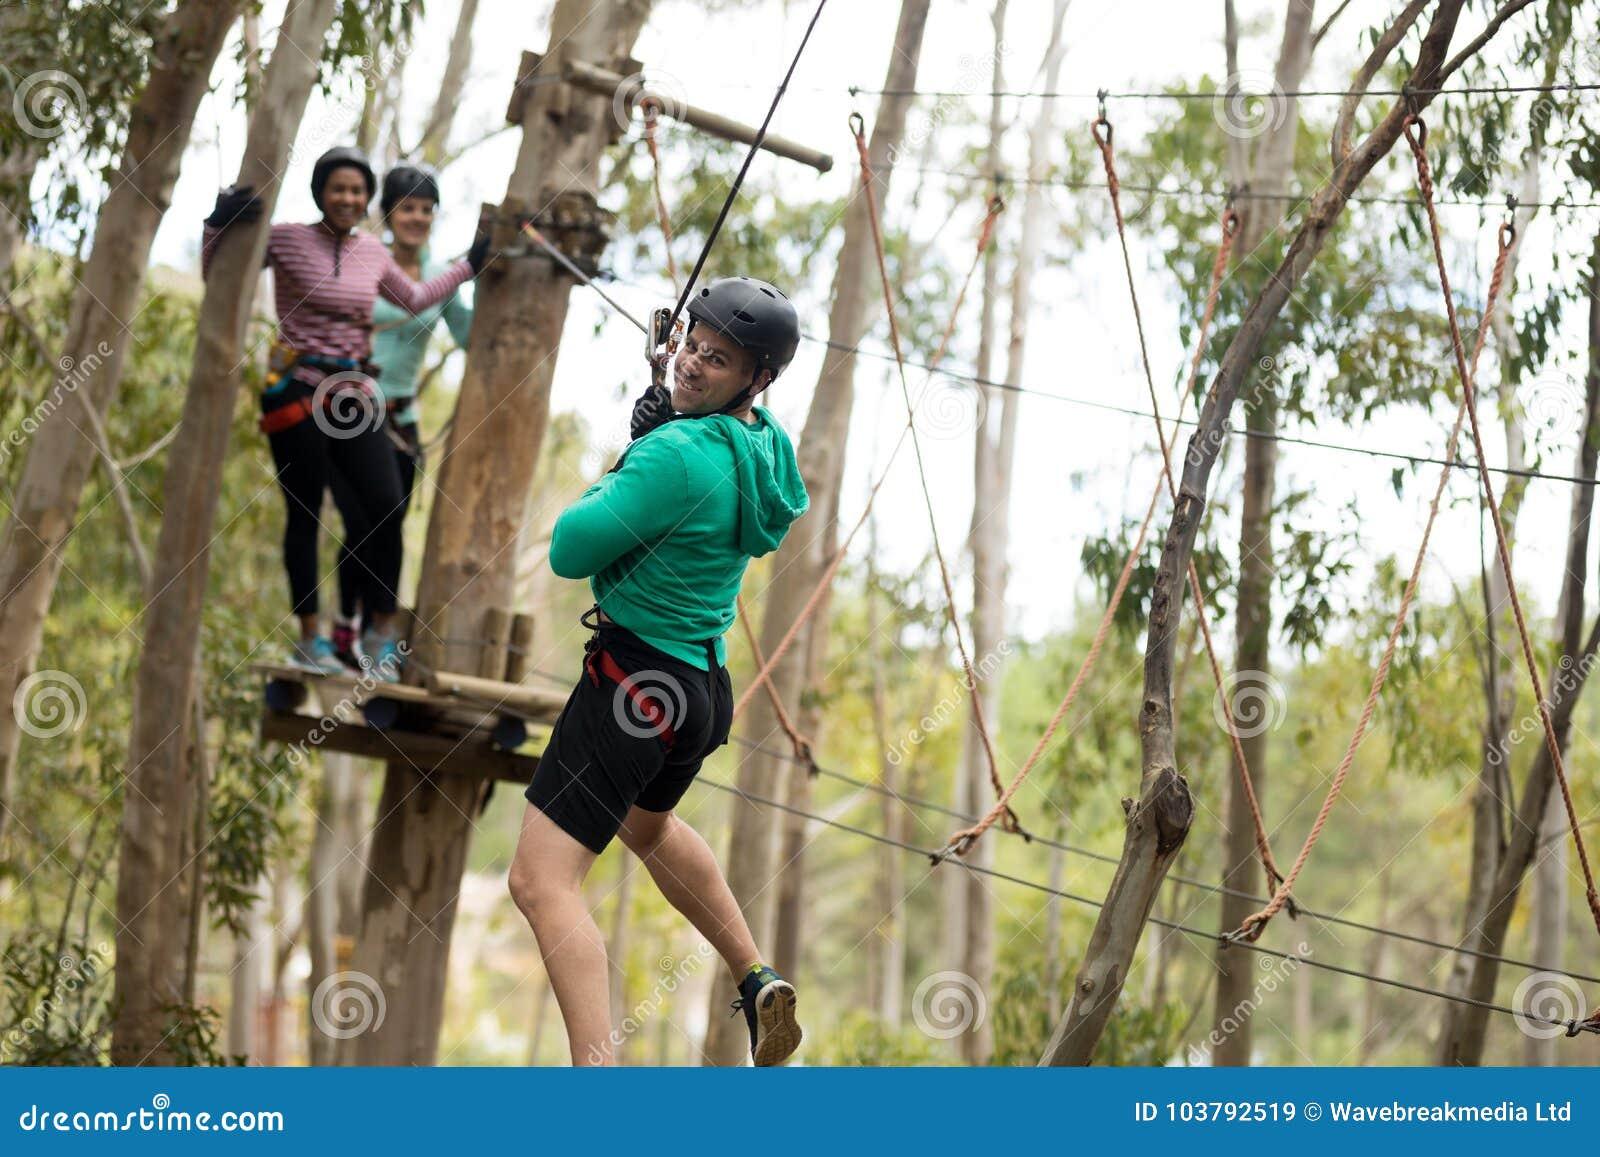 Man On Zipline In Adventure Park Stock Image Image Of Hanging Line 103792519